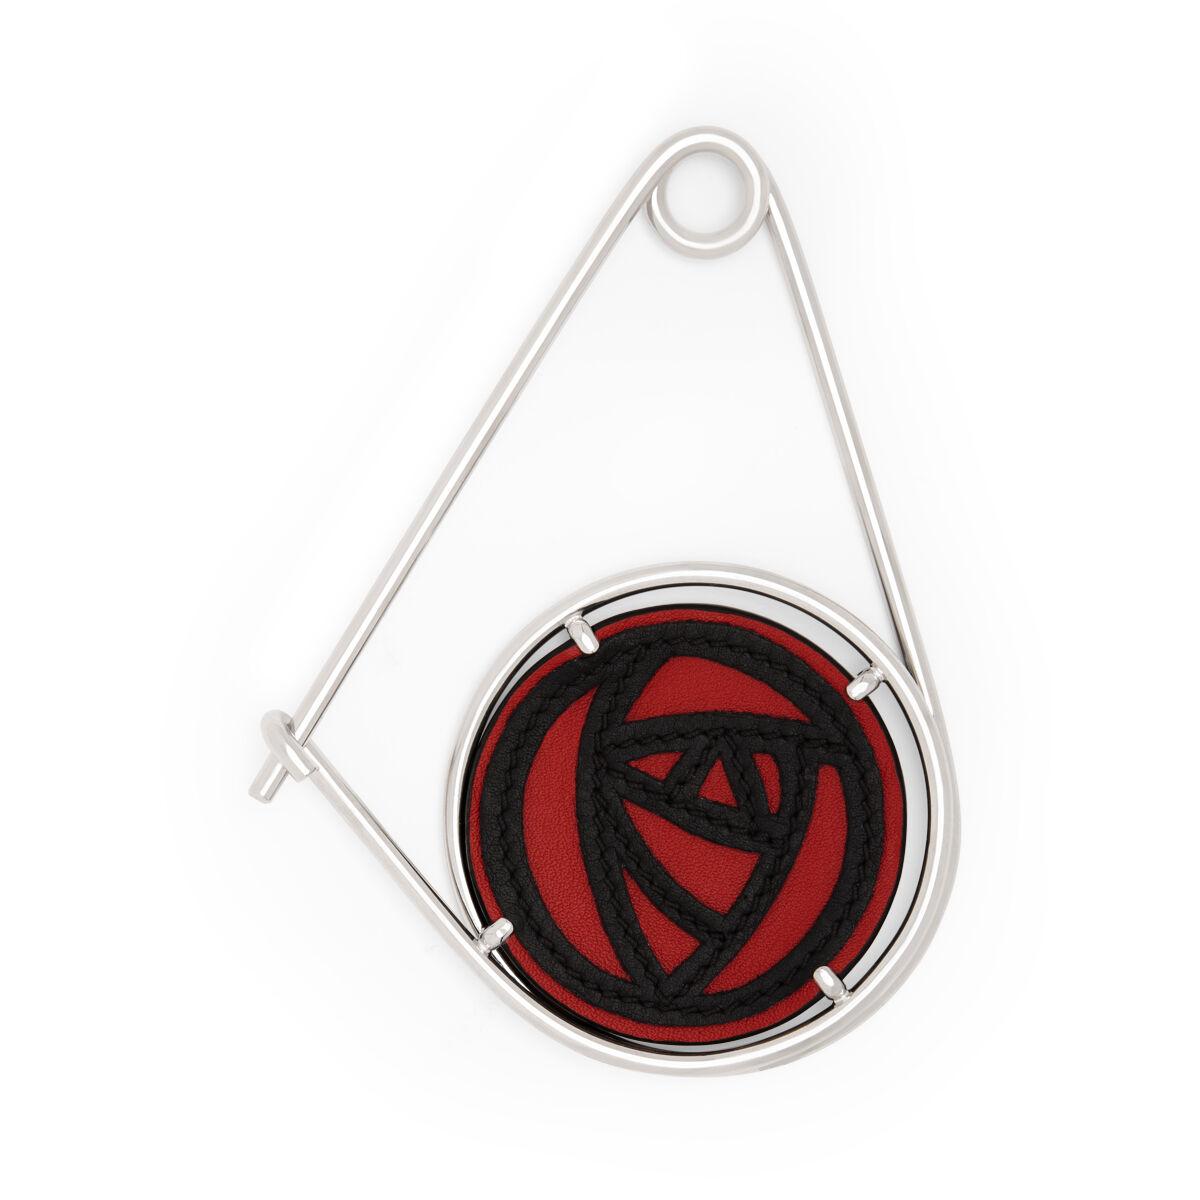 LOEWE Roses Meccano Pin Scarlet Red/Black all